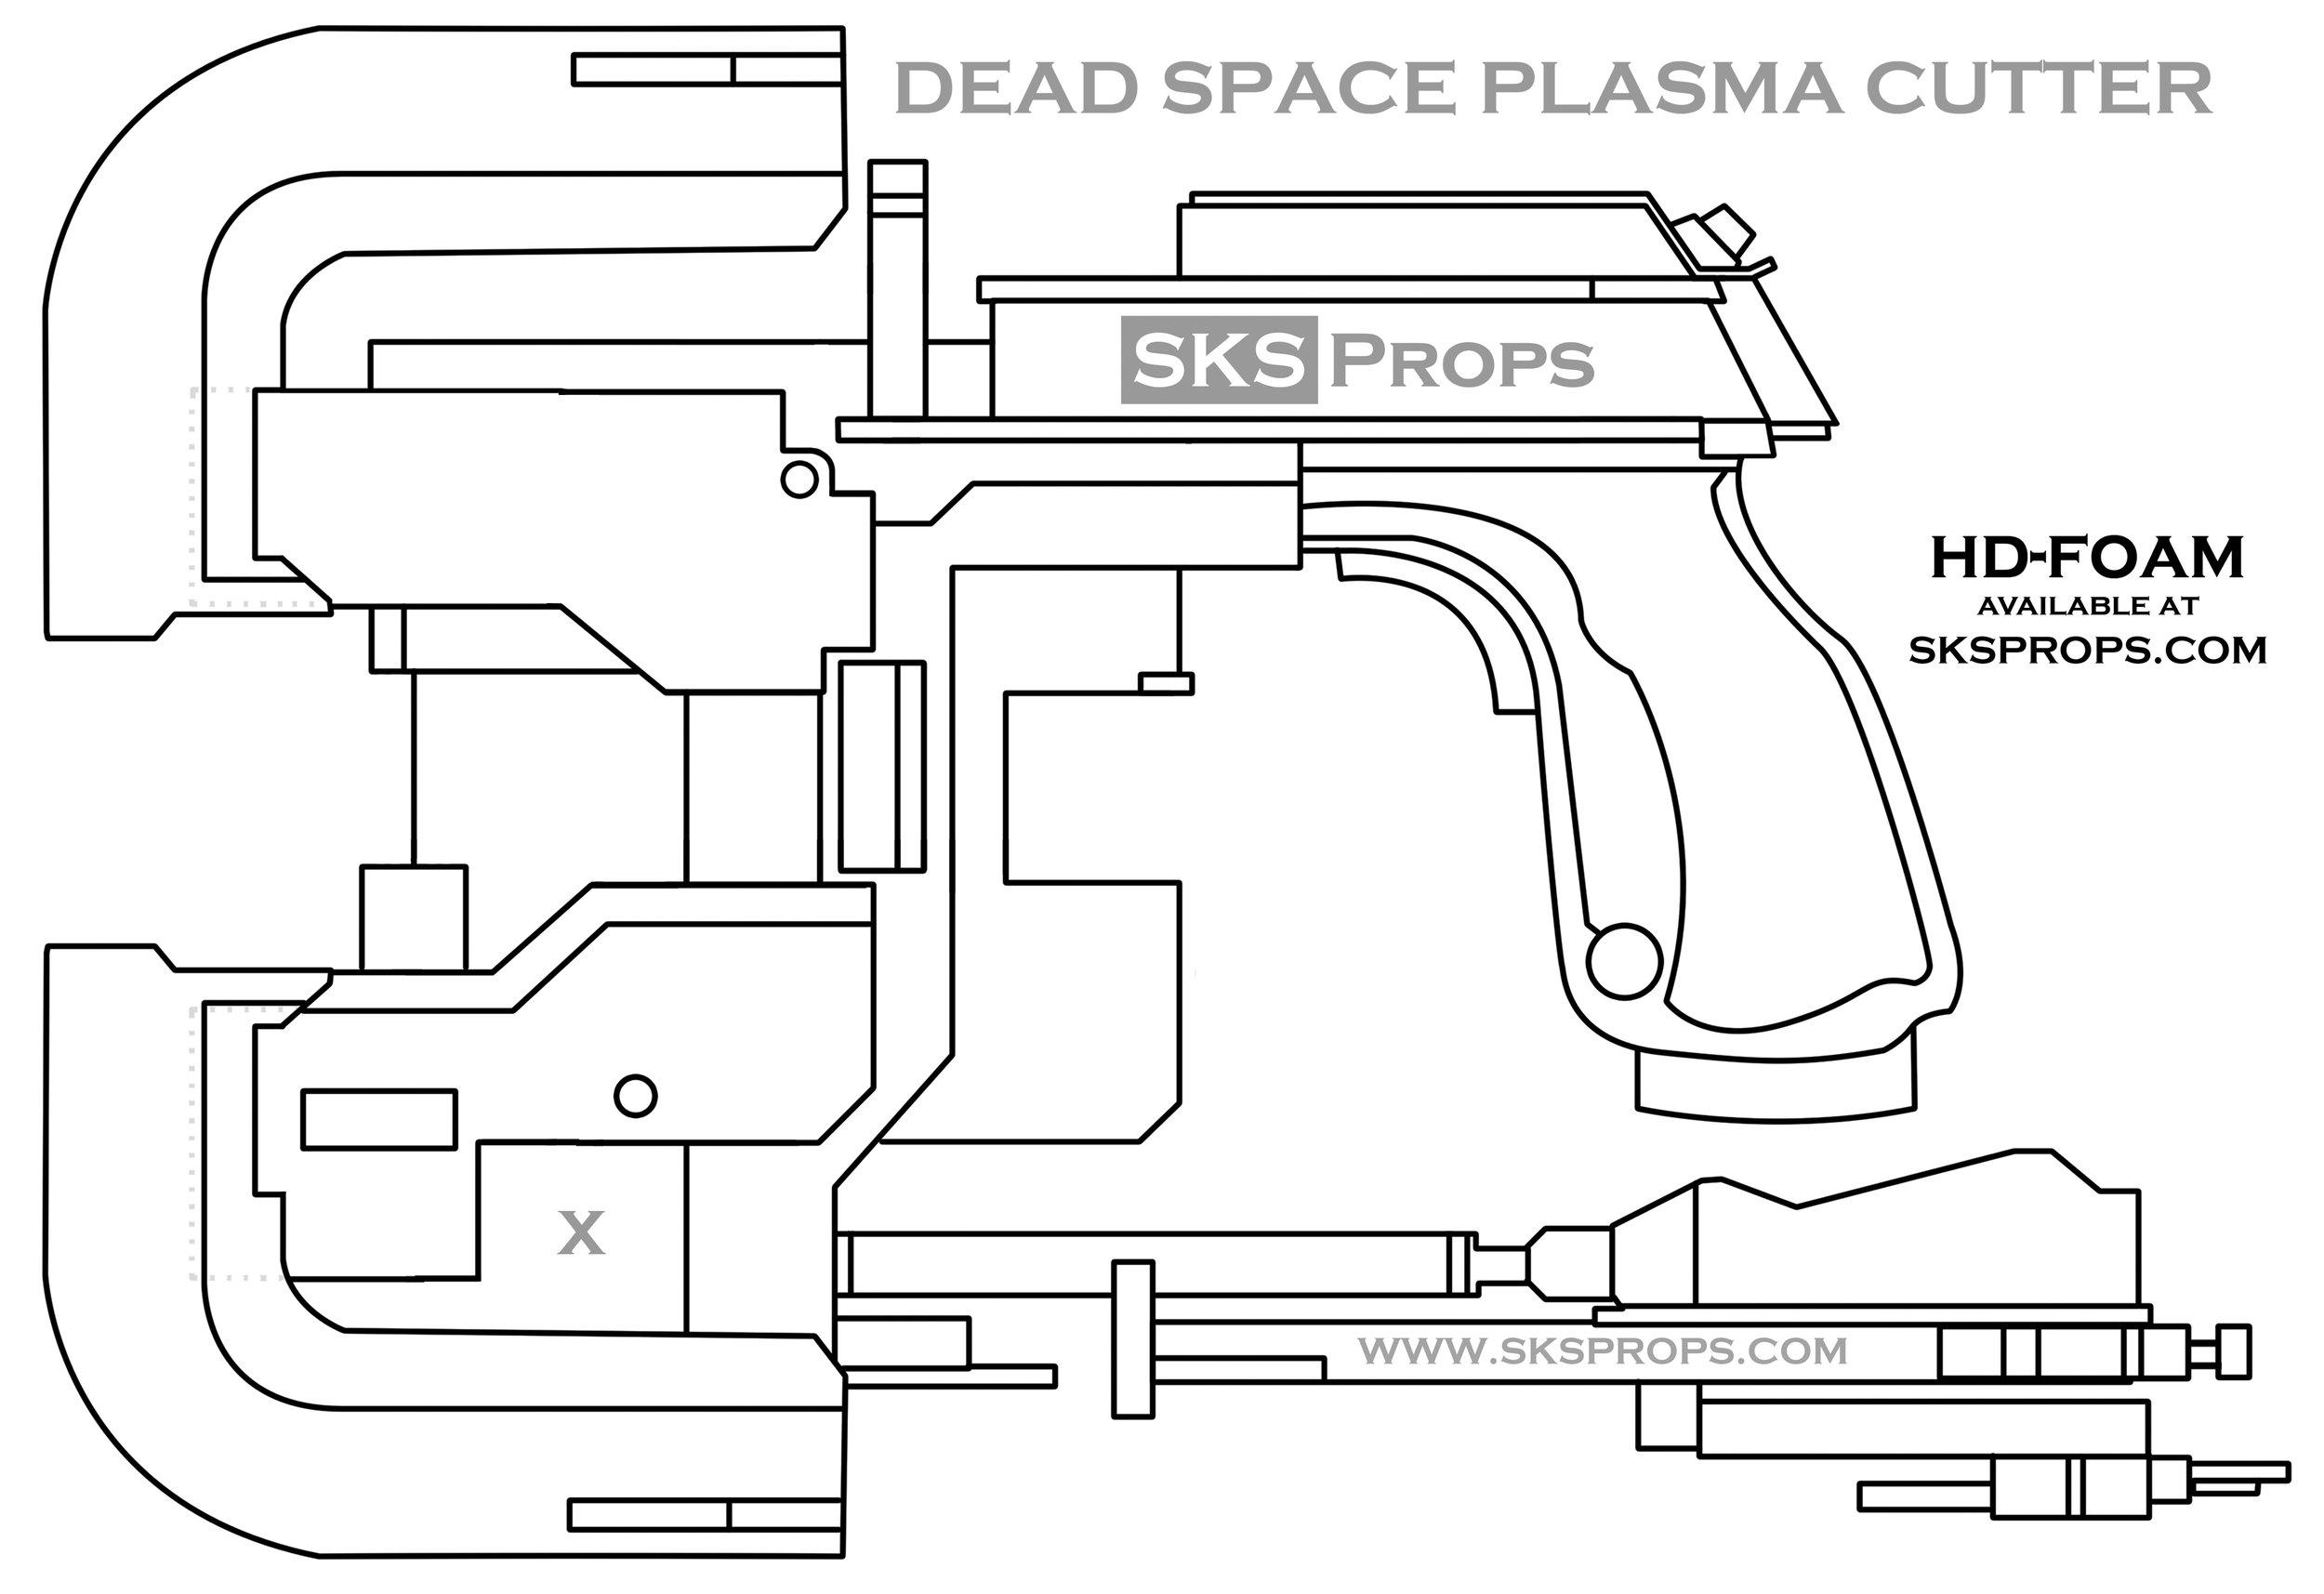 DEAD SPACE Plasma Cutter.jpg